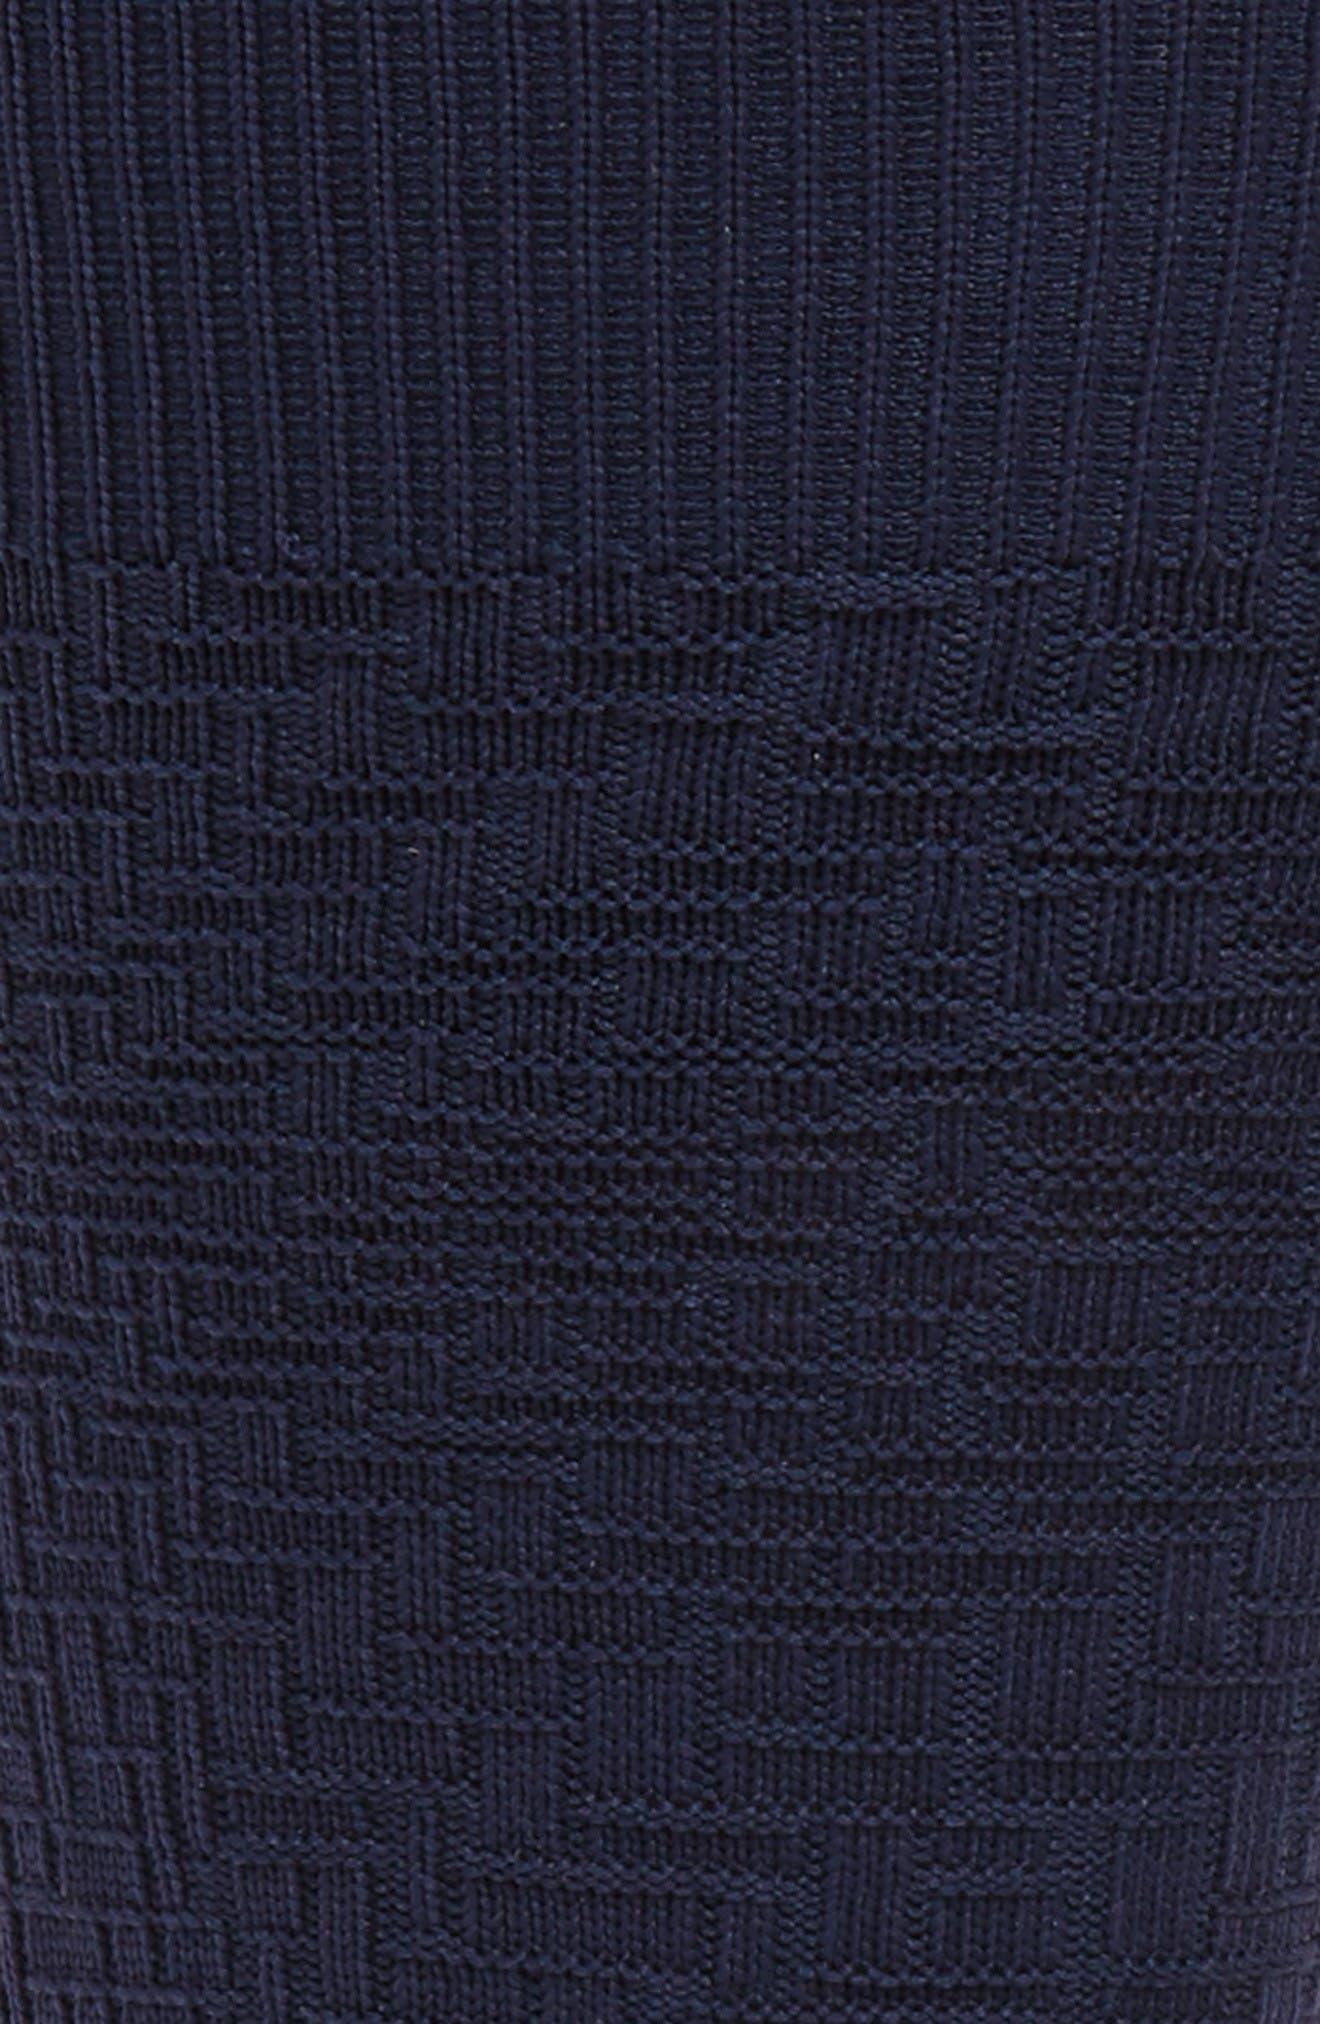 Distorted Texture Crew Socks,                             Alternate thumbnail 2, color,                             Marine Blue